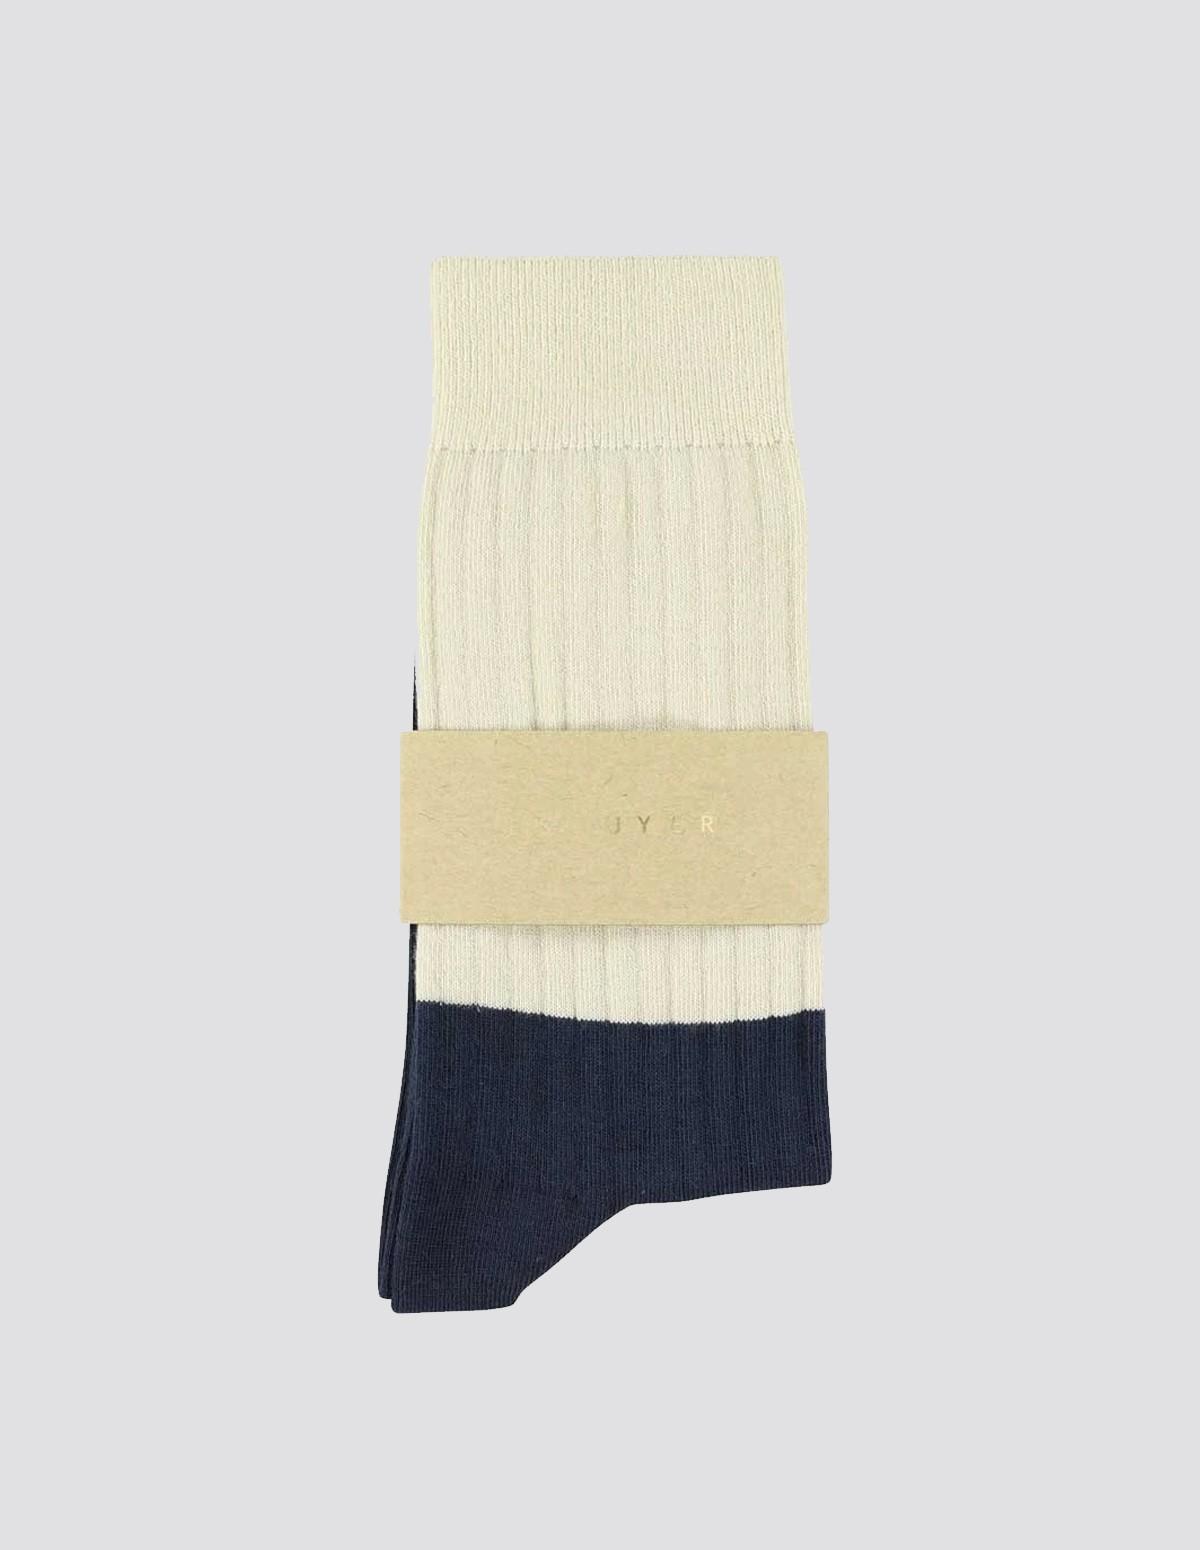 Escuyer Colour Block Socks - ECRU/NAVY